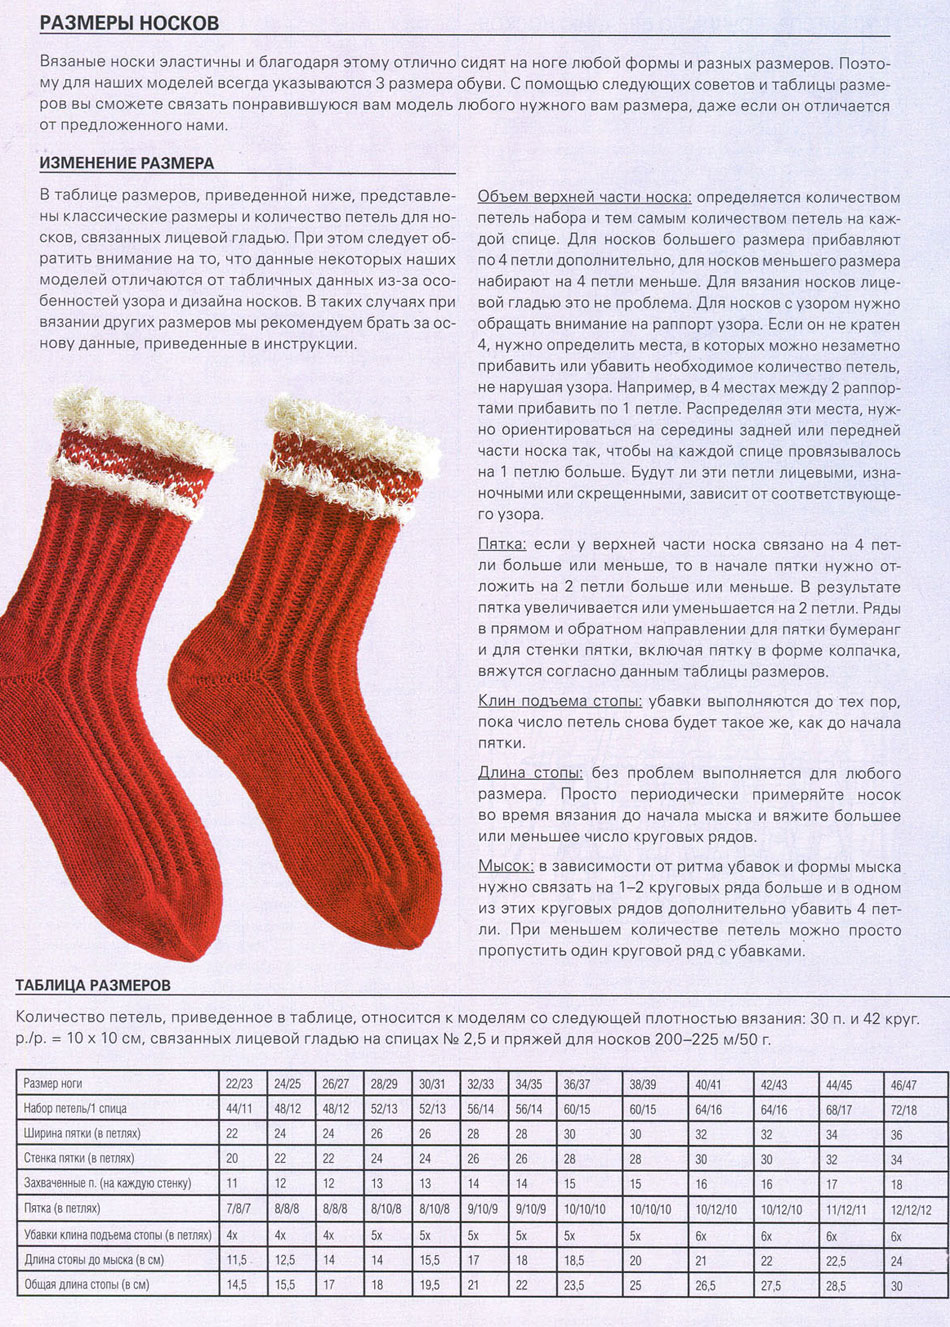 Носки, тапочки Вязание спицами, крючком, уроки вязания 91